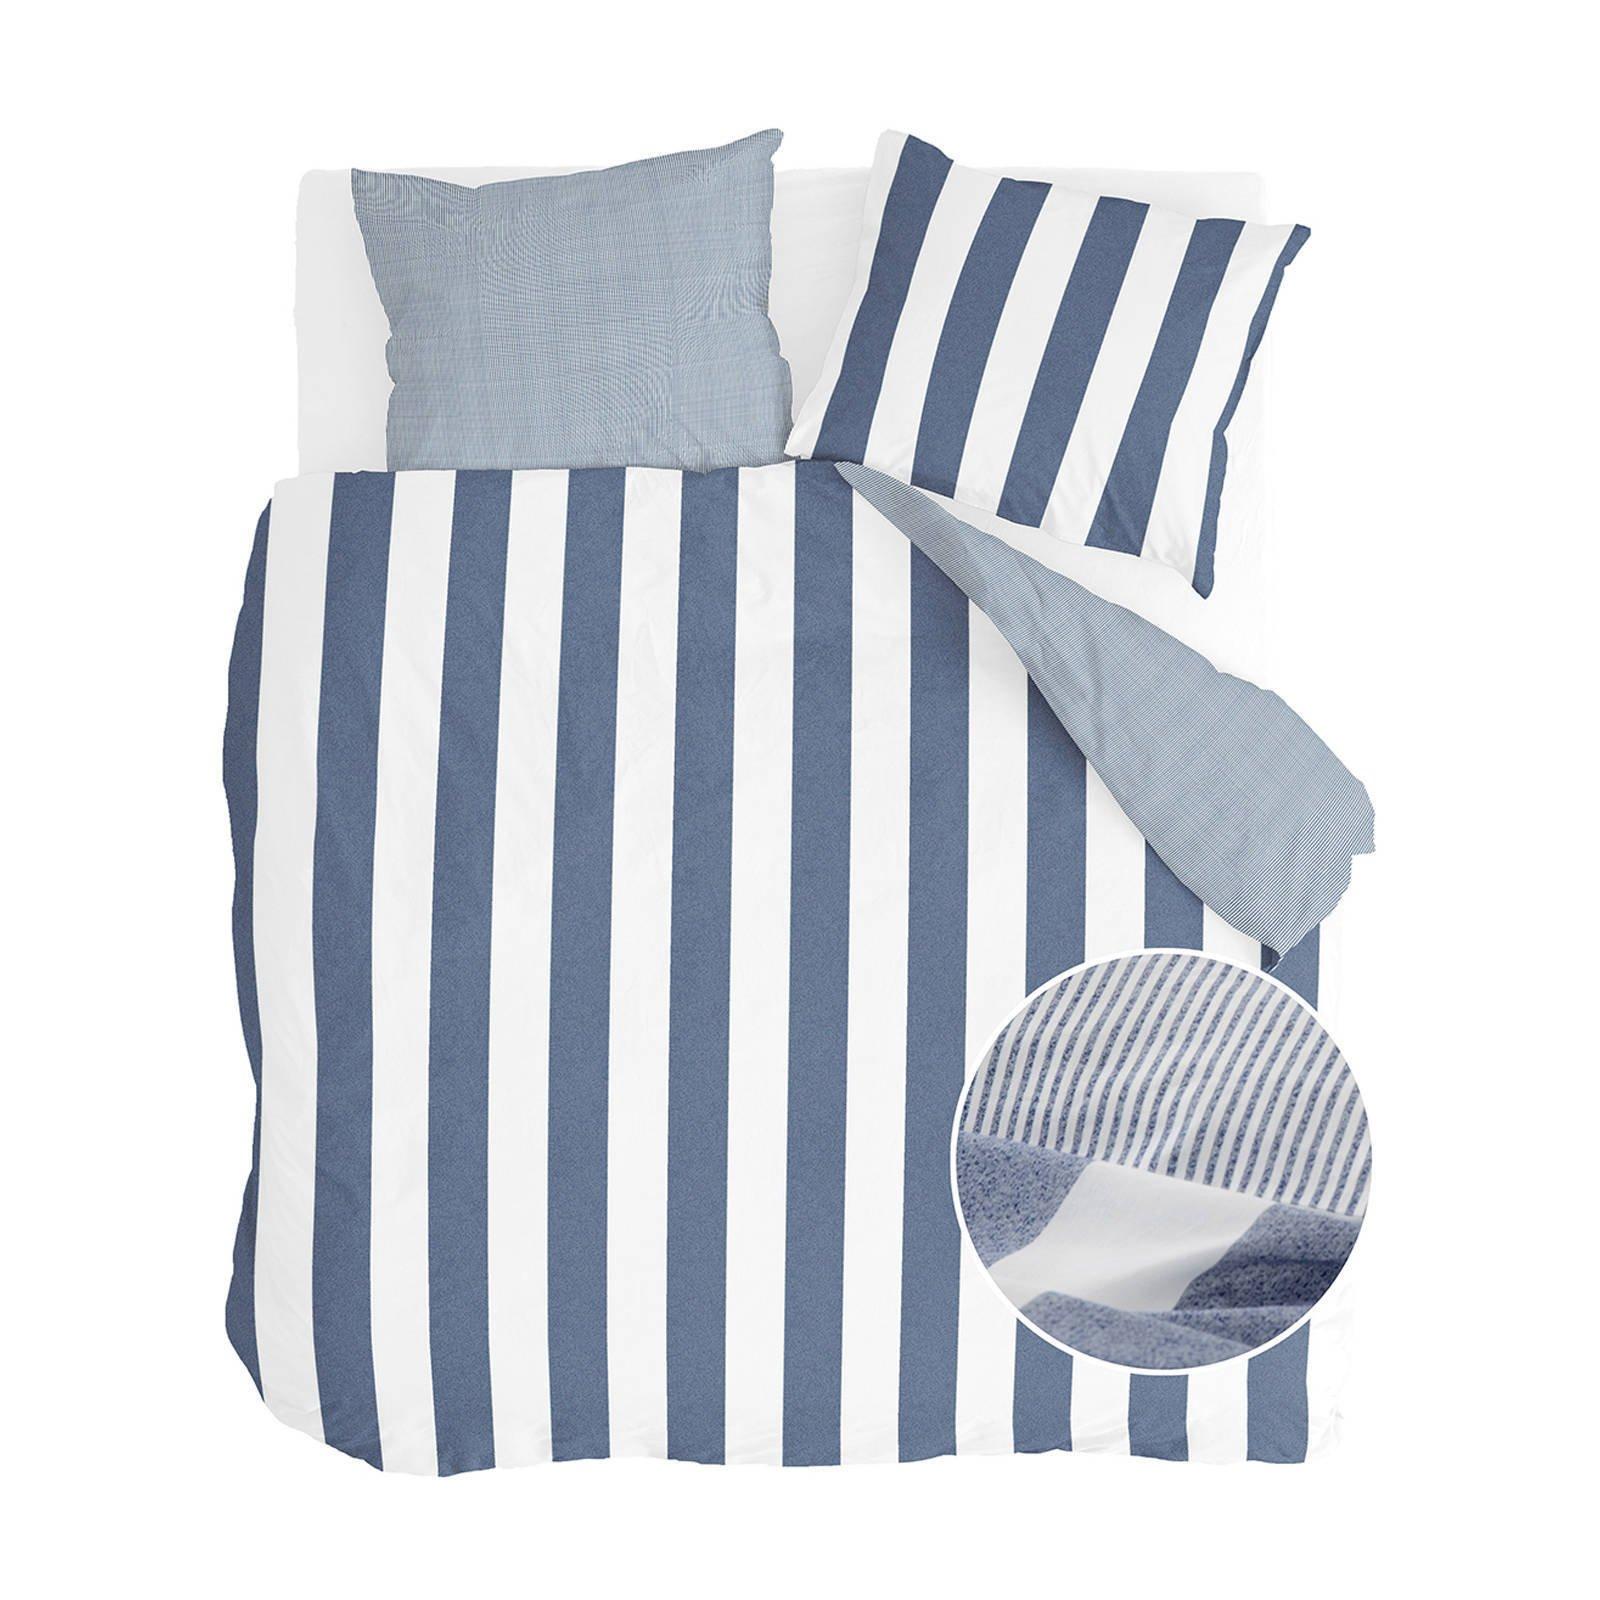 walra katoenen dekbedovertrek lits jum blauw